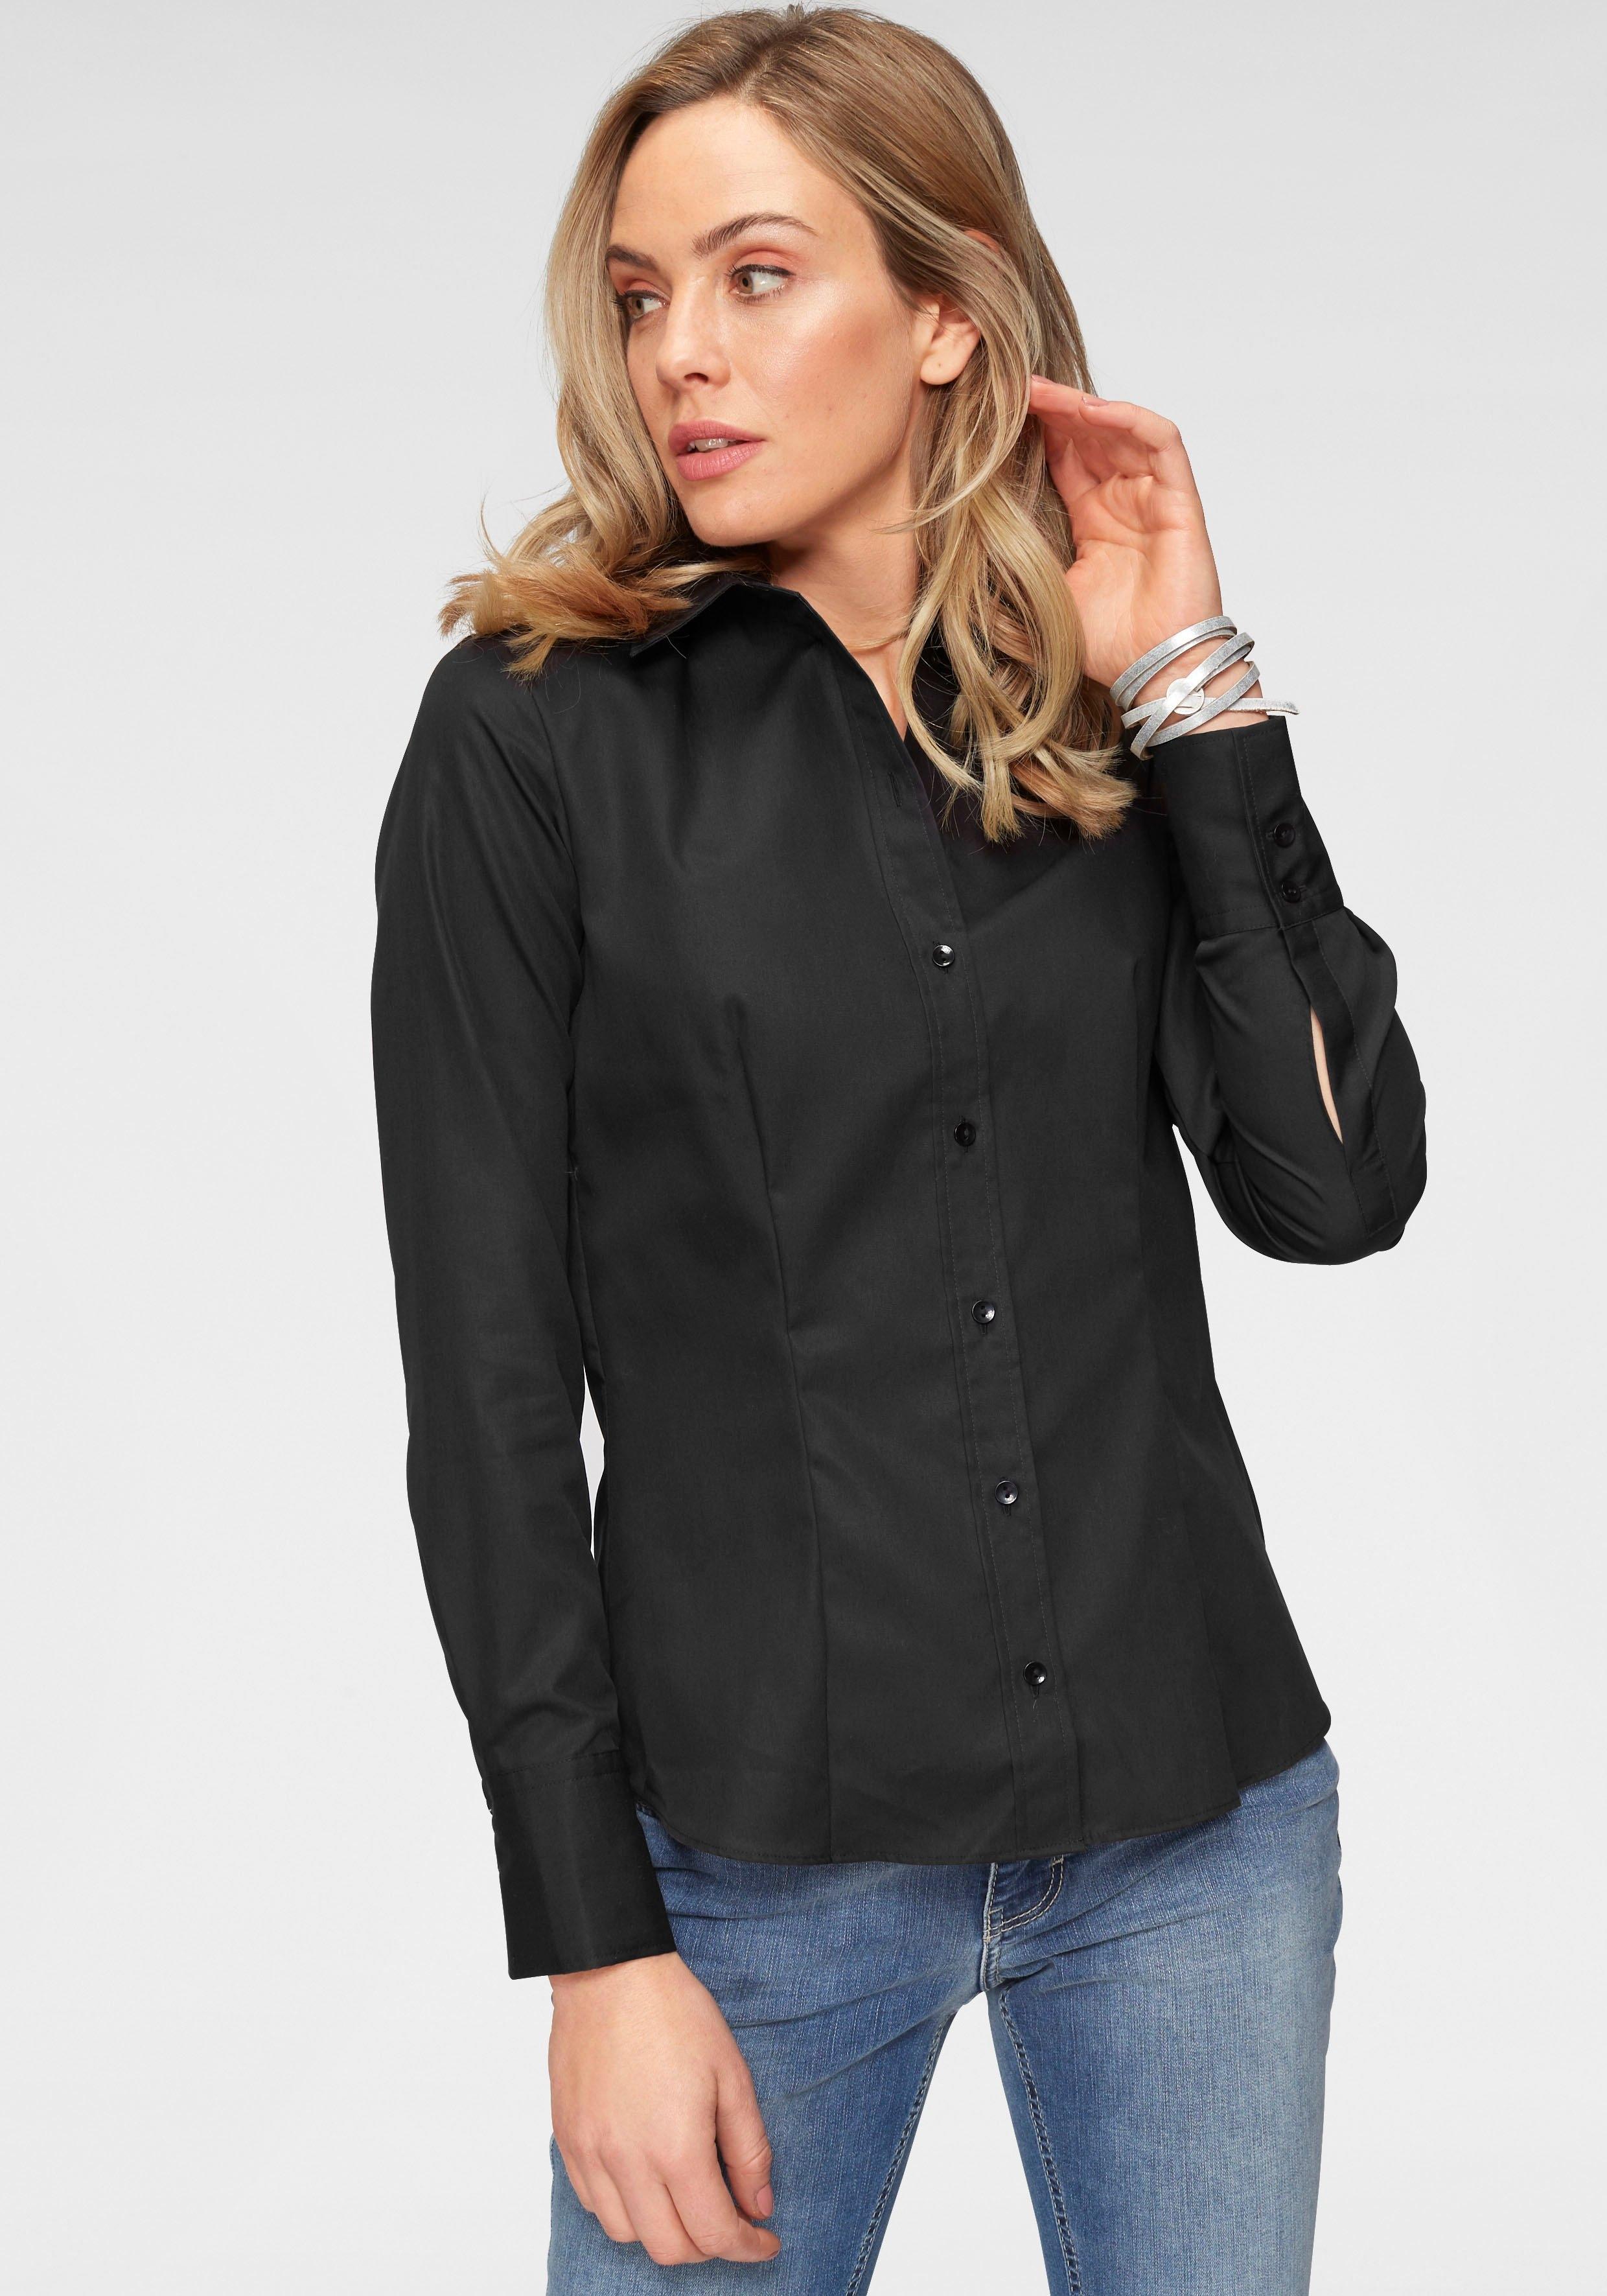 seidensticker klassieke blouse met extra brede manchetten online kopen op otto.nl